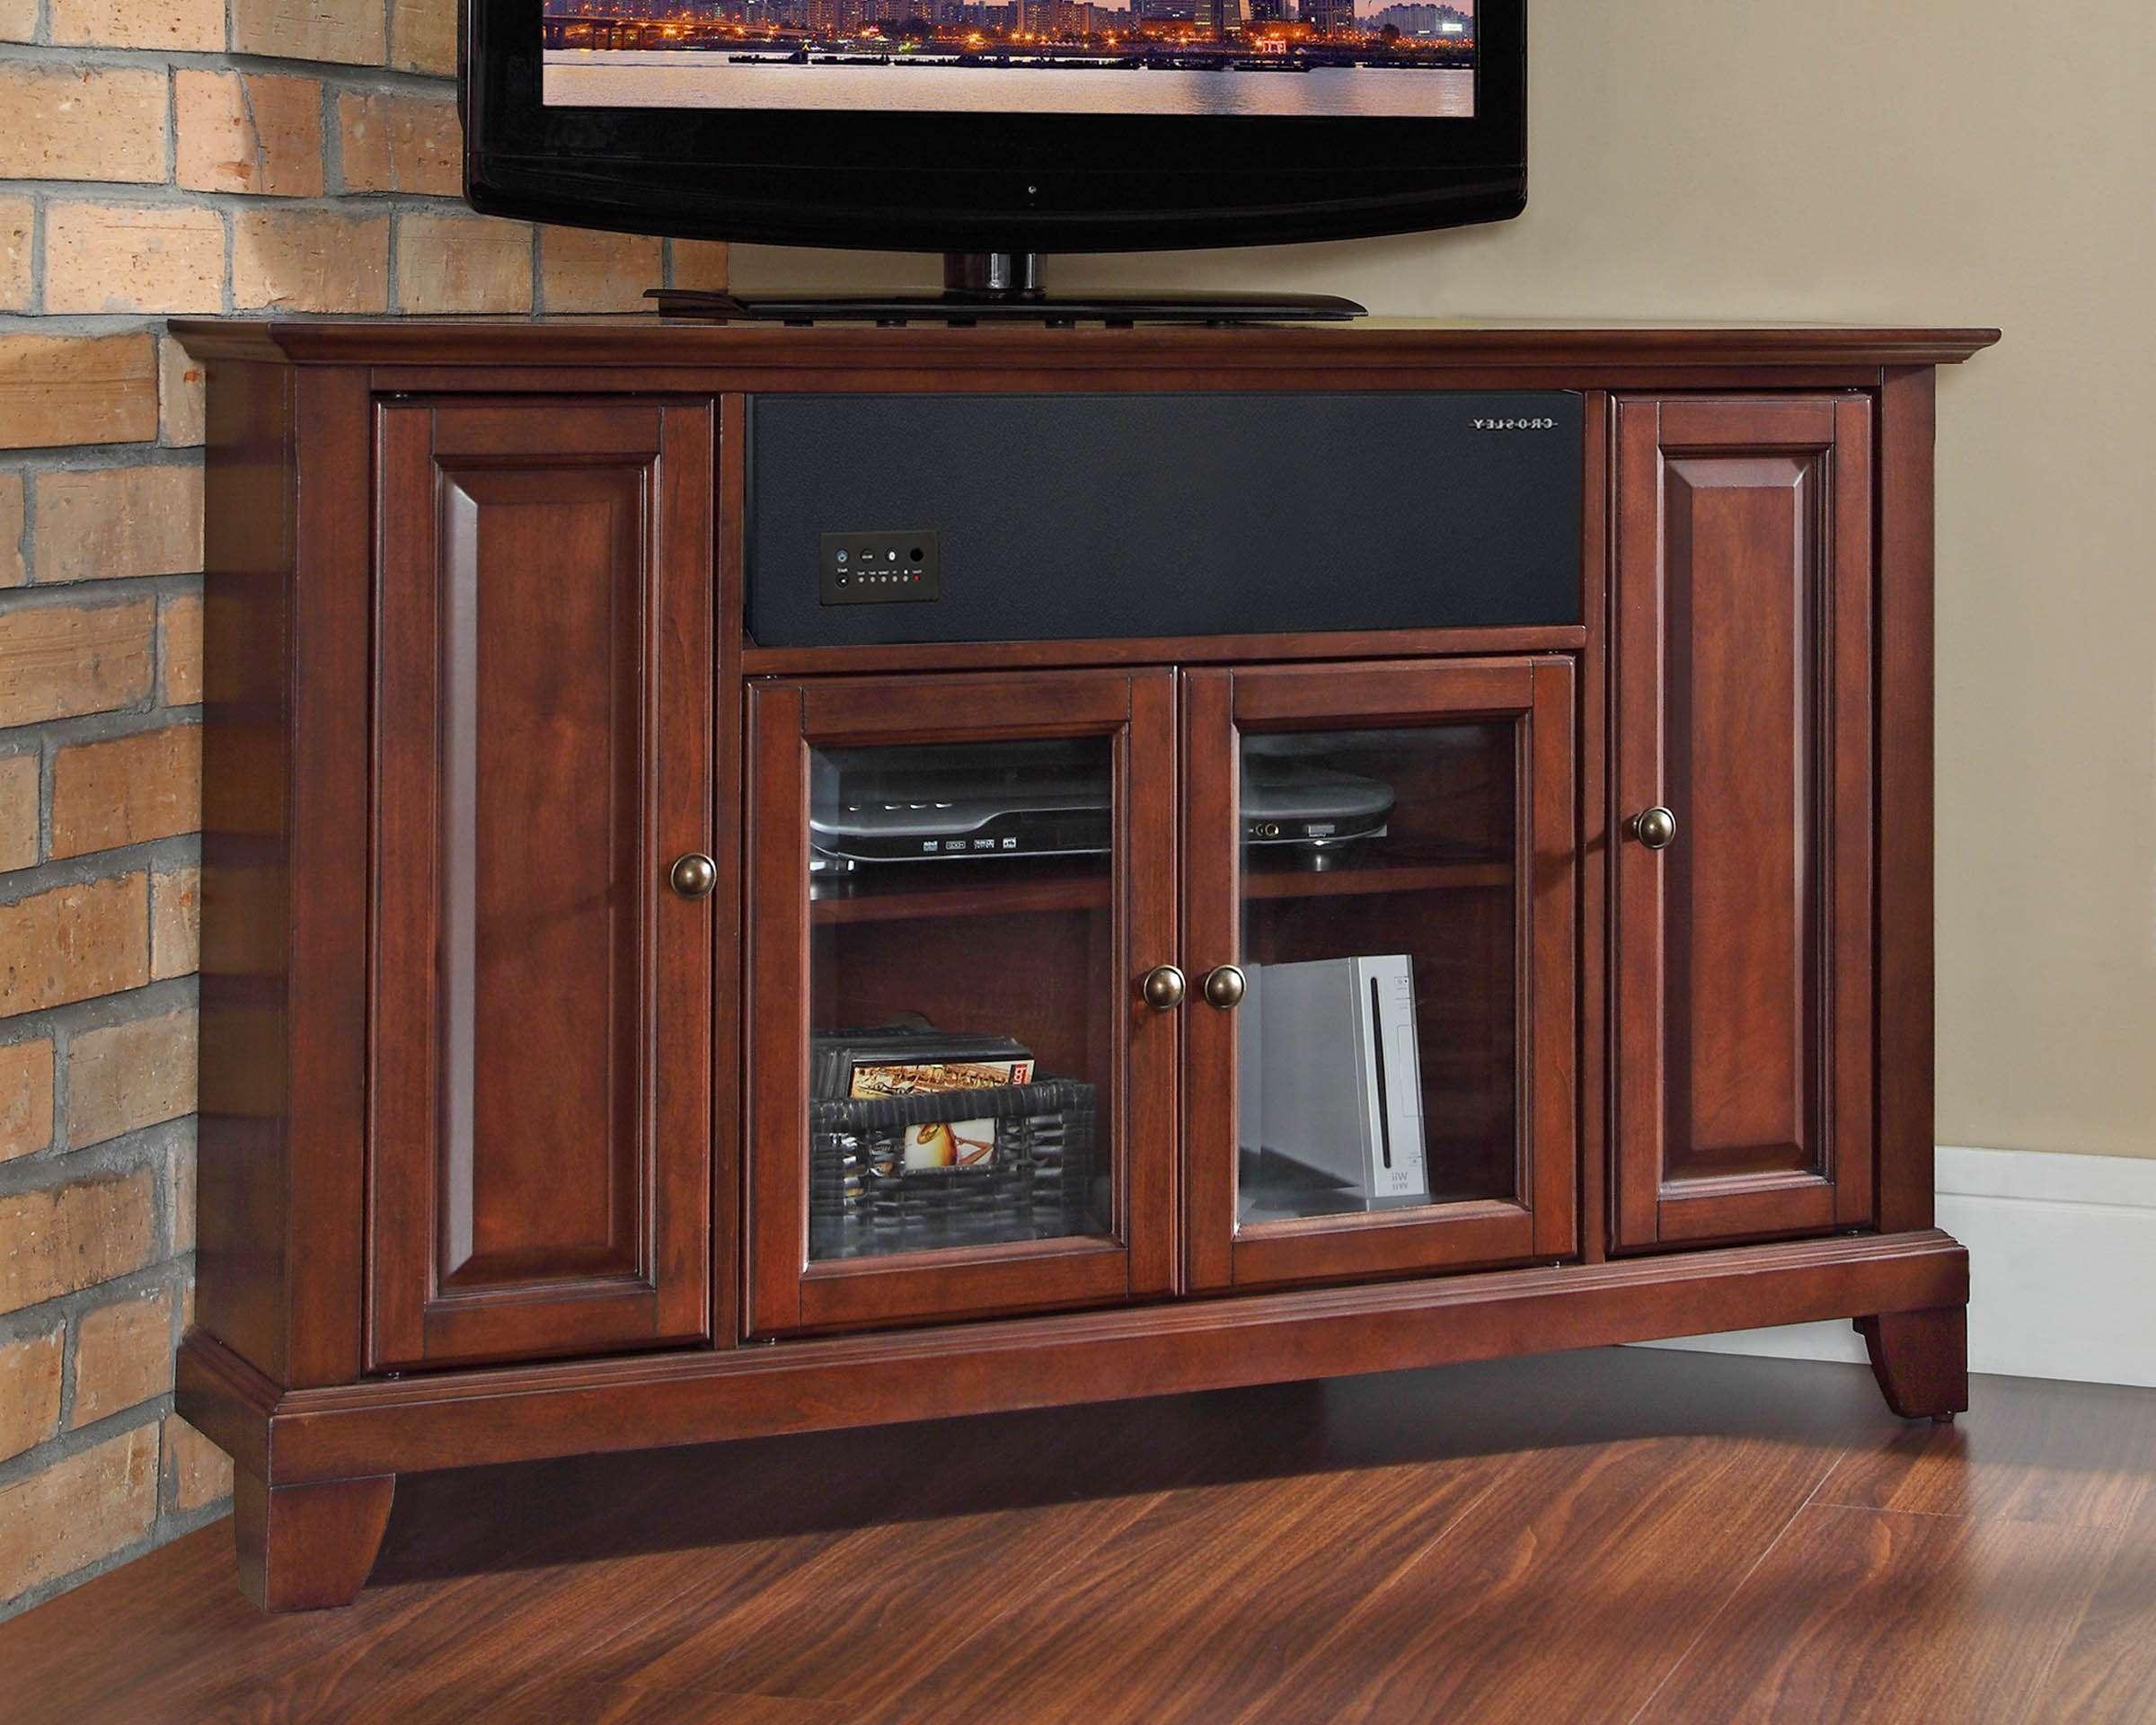 Crosley Furniture Newport 48 Inch Corner Aroundsound Tv Stand In With Regard To Mahogany Corner Tv Cabinets (View 12 of 20)